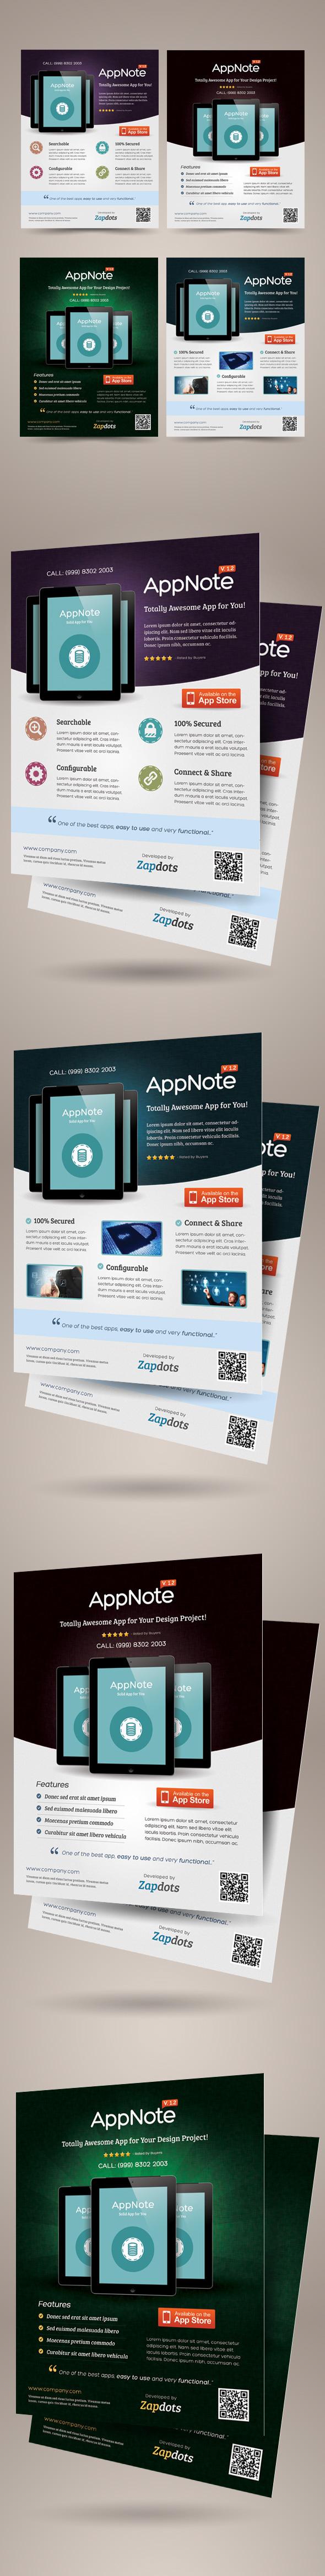 mobile app promotion flyers on behance